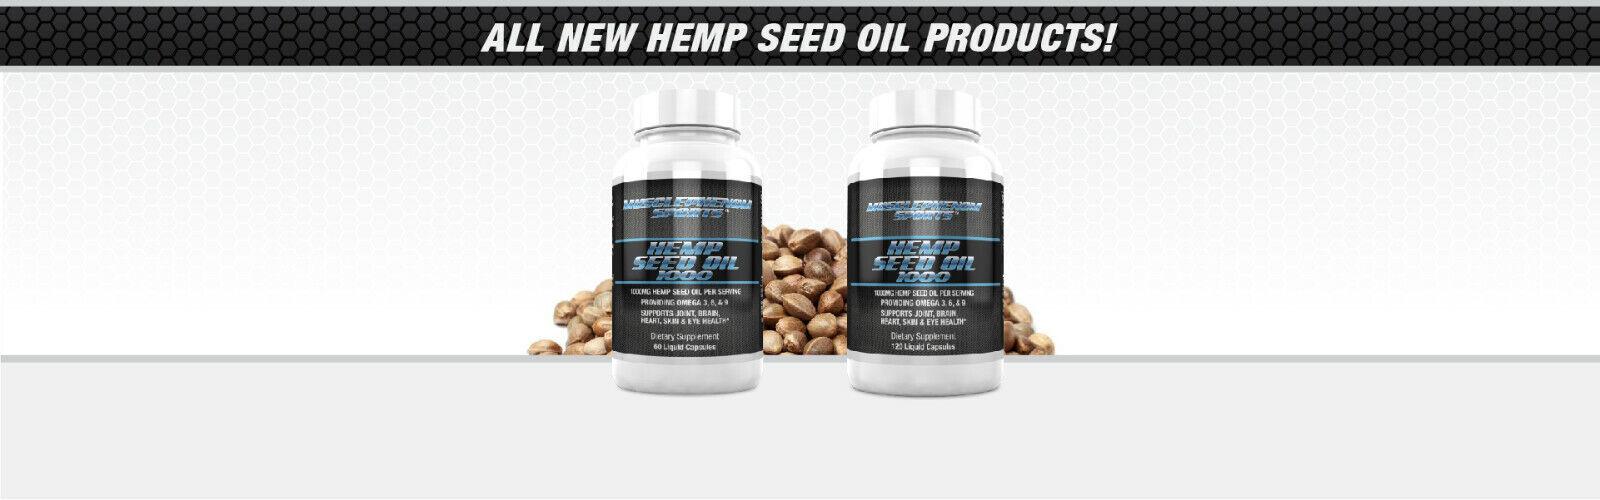 Hemp Seed Oil Capsules 1000mg 3 bottles 180 capsules 3 month supply 6